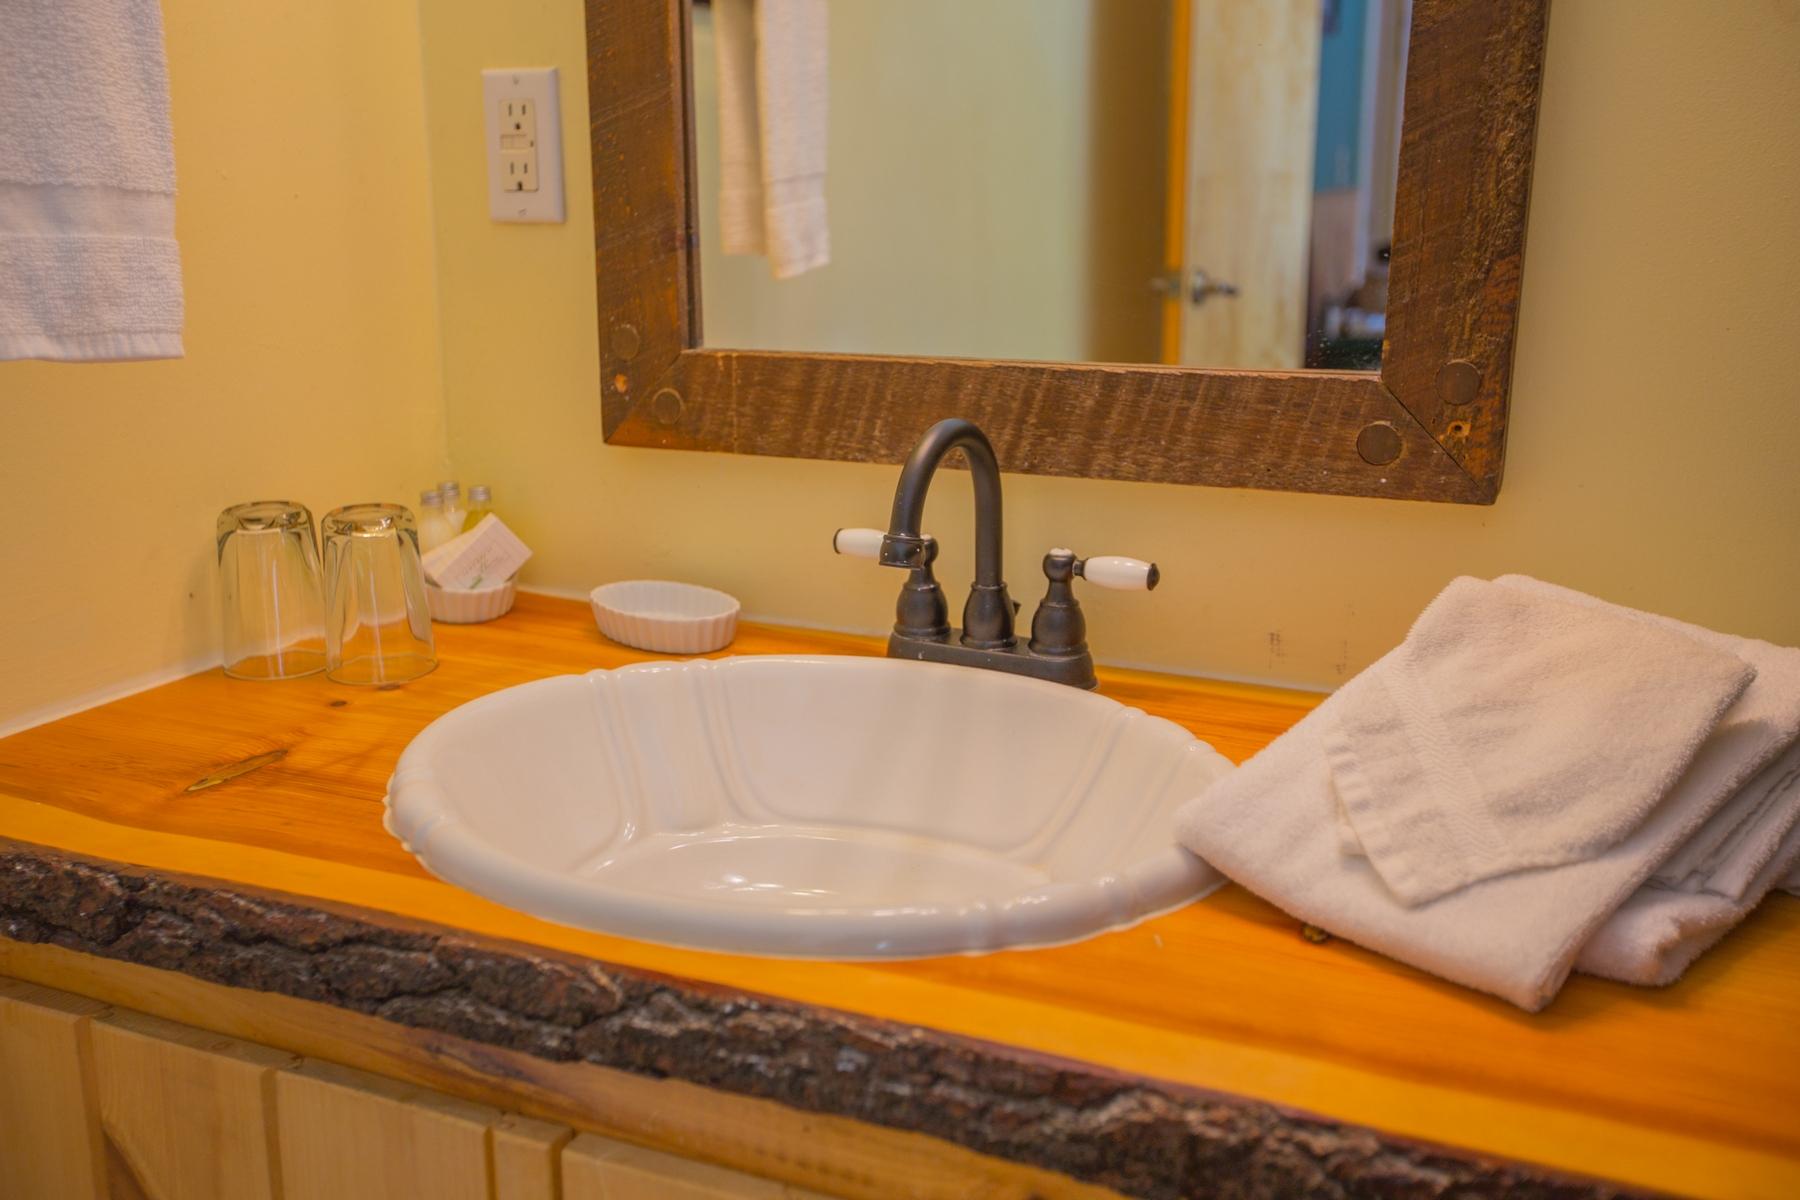 Additional photo for property listing at Adirondack Inn on Big Moose Lake 1510  Big Moose Rd Eagle Bay, New York 13331 United States